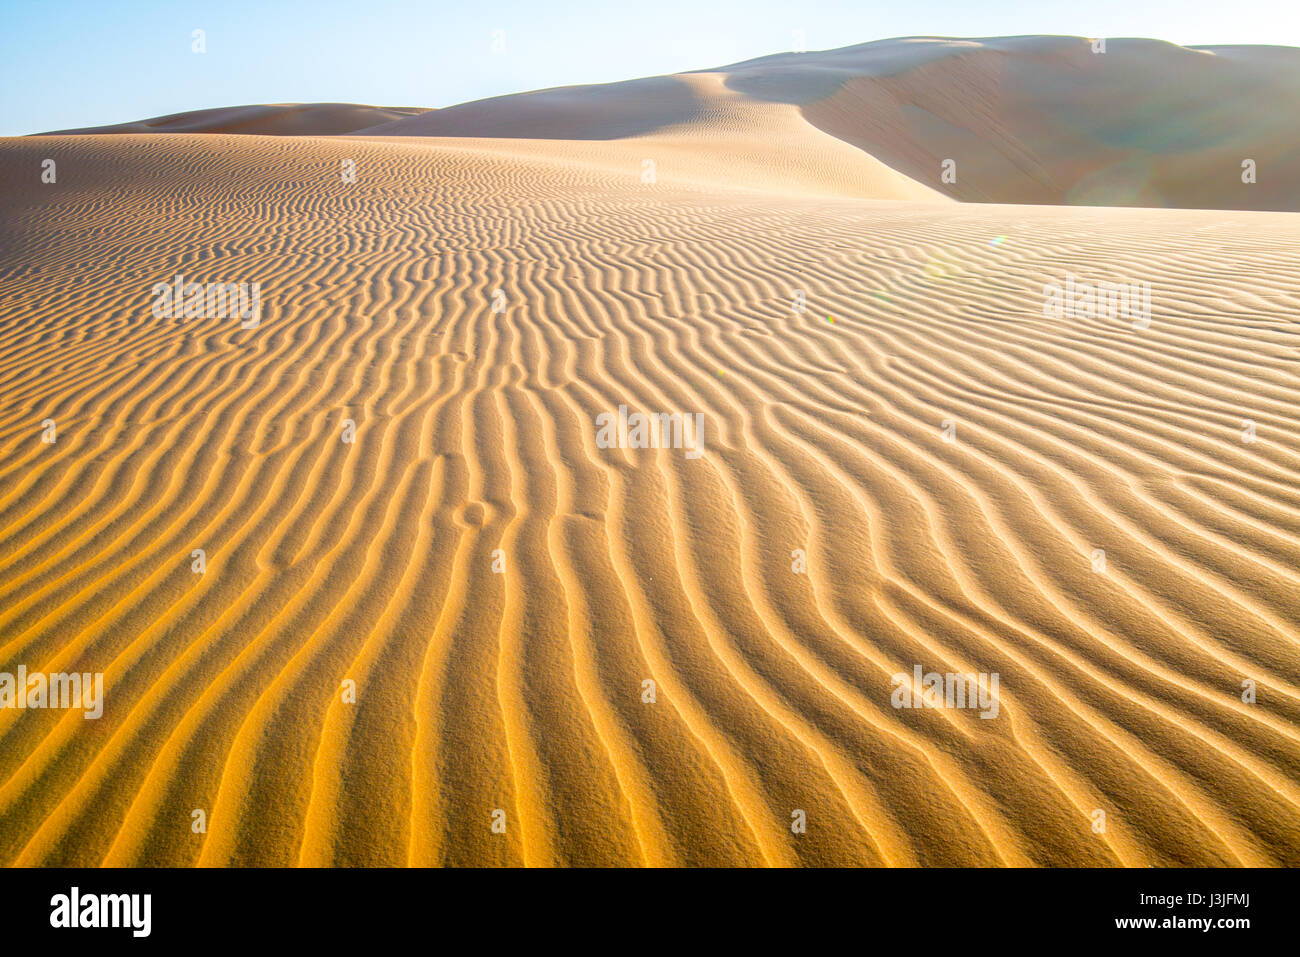 Liwa Oasis, Abu Dhabi , United Arab Emirates -, vast desert landscape scattered with rippling sand dunes   The Empty - Stock Image